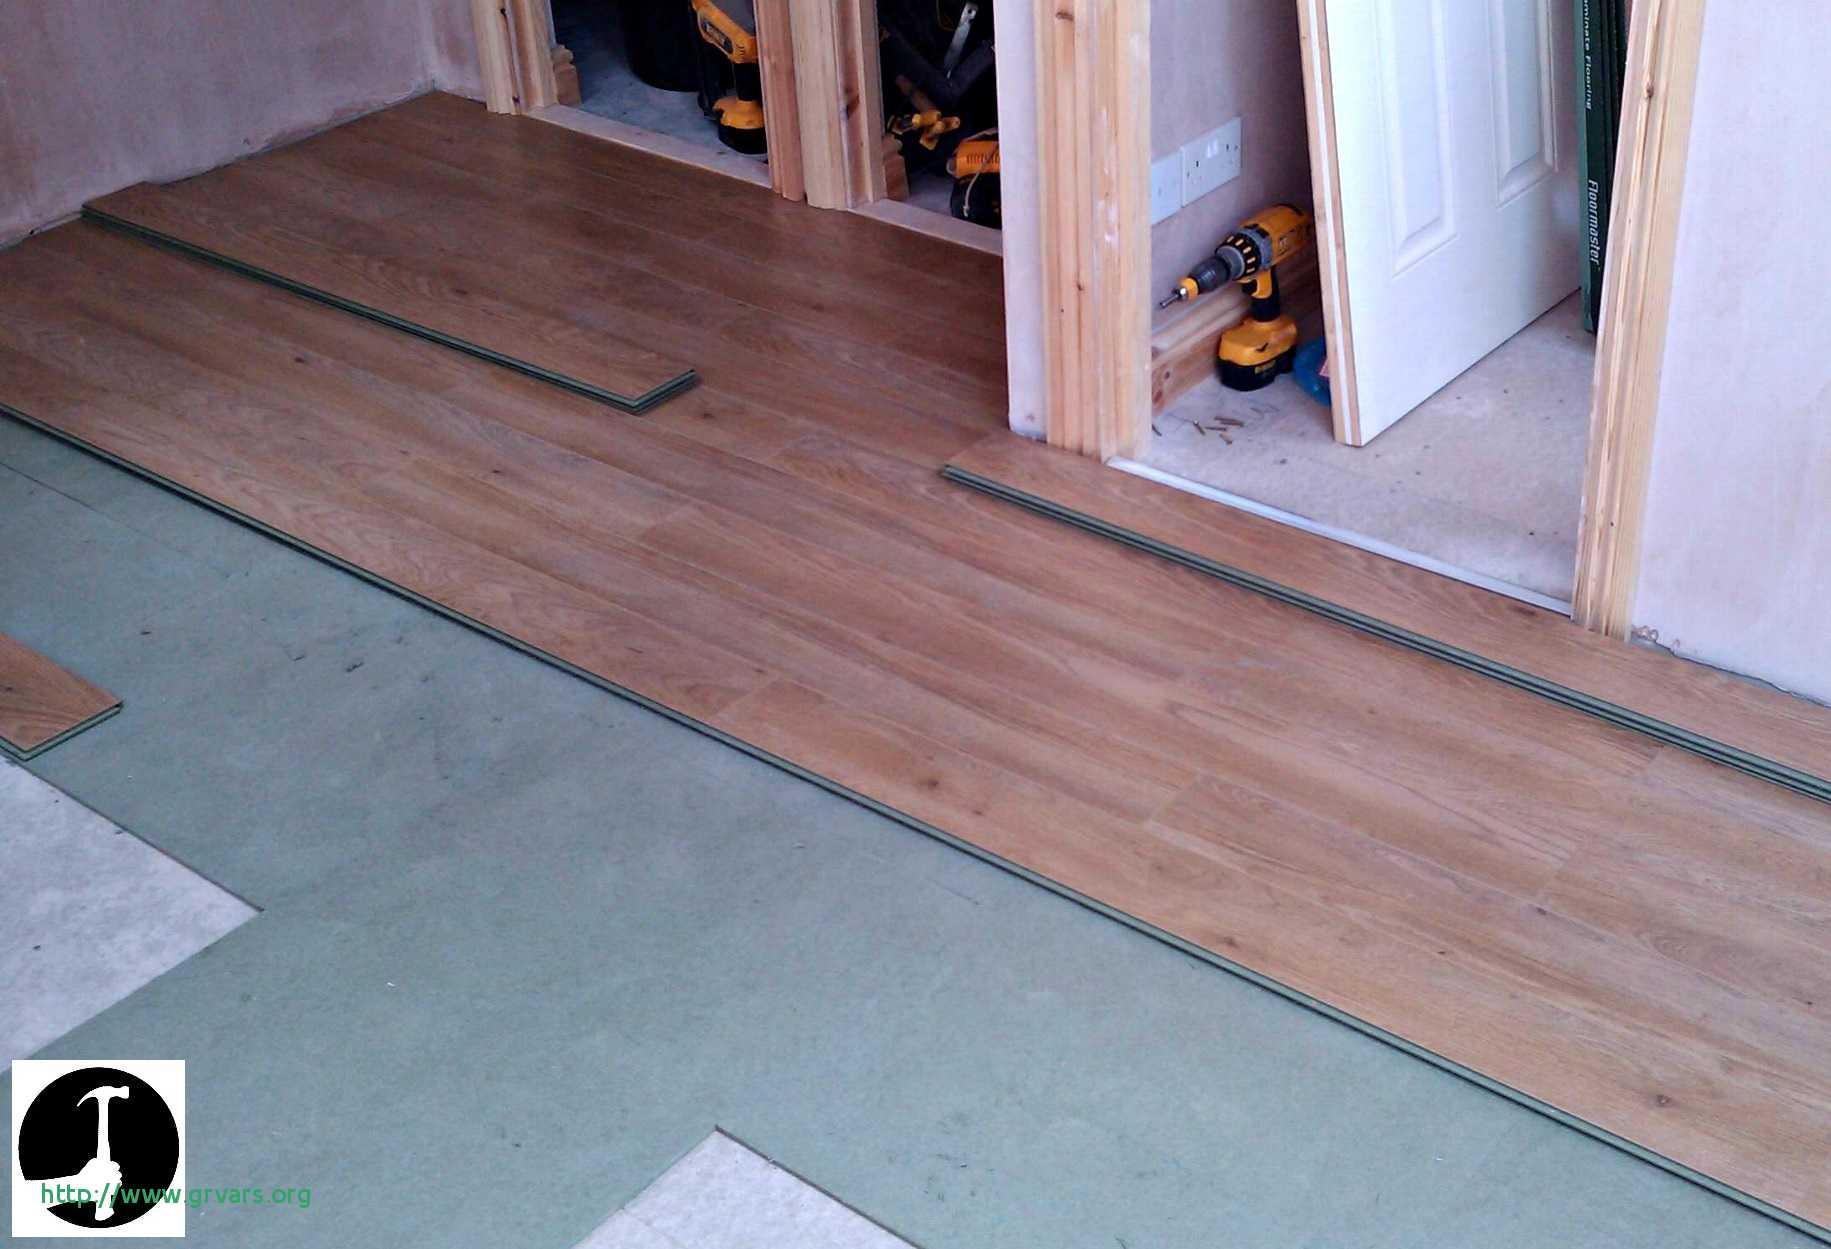 hardwood floor cleaning memphis of 25 meilleur de putting down linoleum flooring ideas blog throughout laying laminate flooring